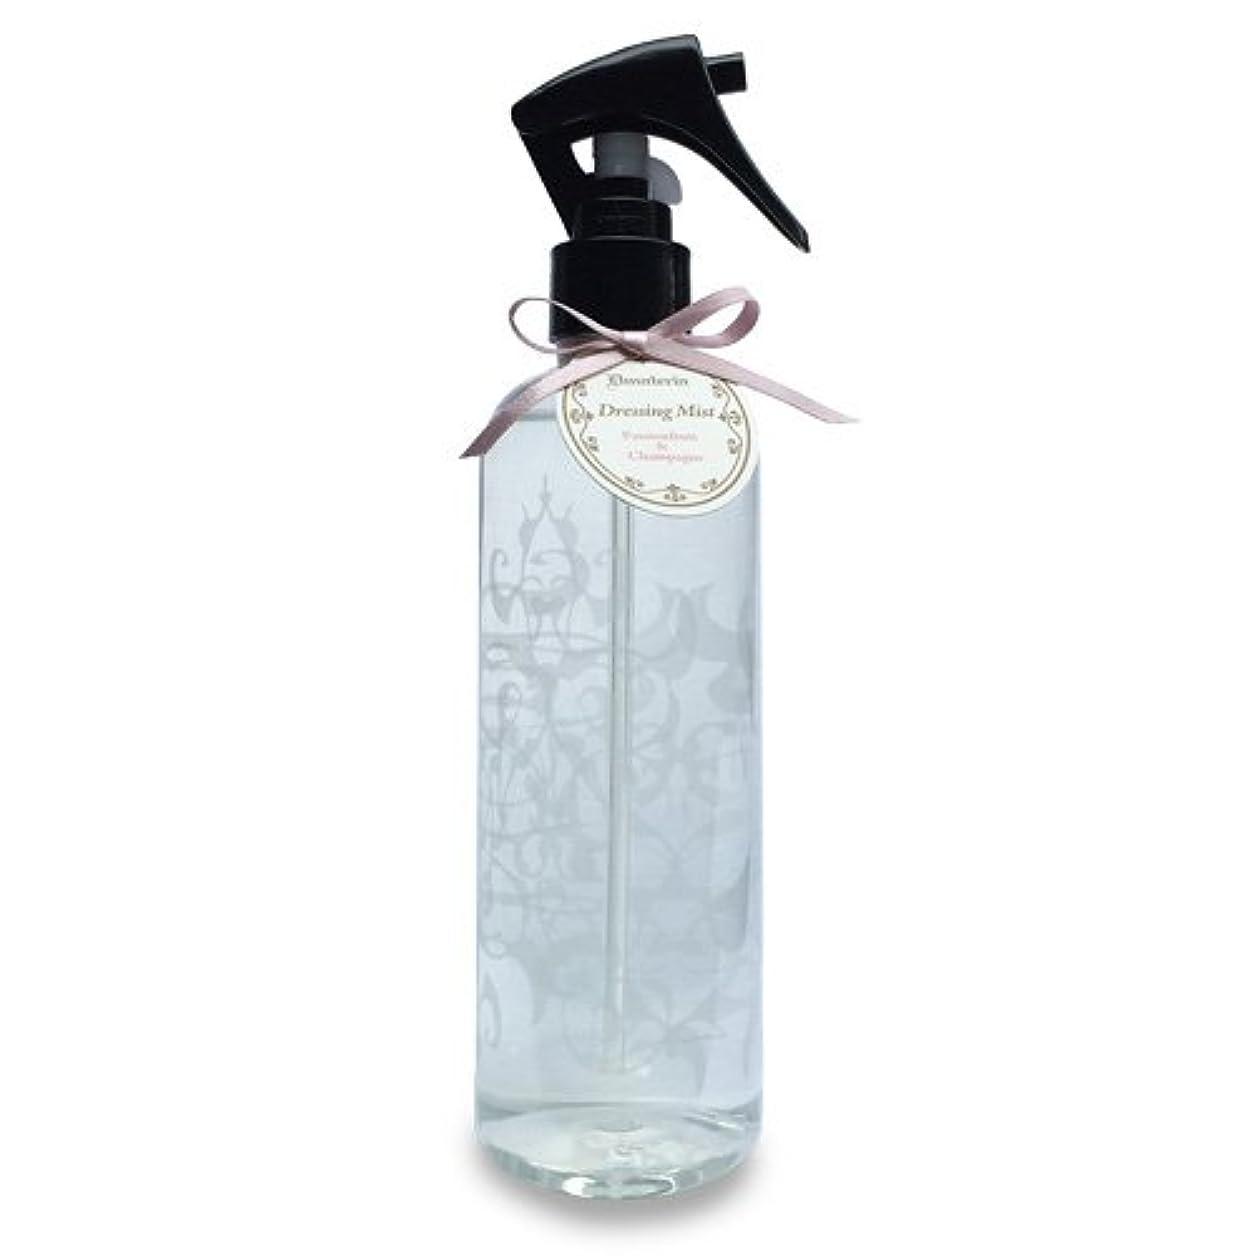 D materia ドレッシングミスト パッションフルーツ&シャンパン Passionfruit&Champagne Dressing Mist ディーマテリア